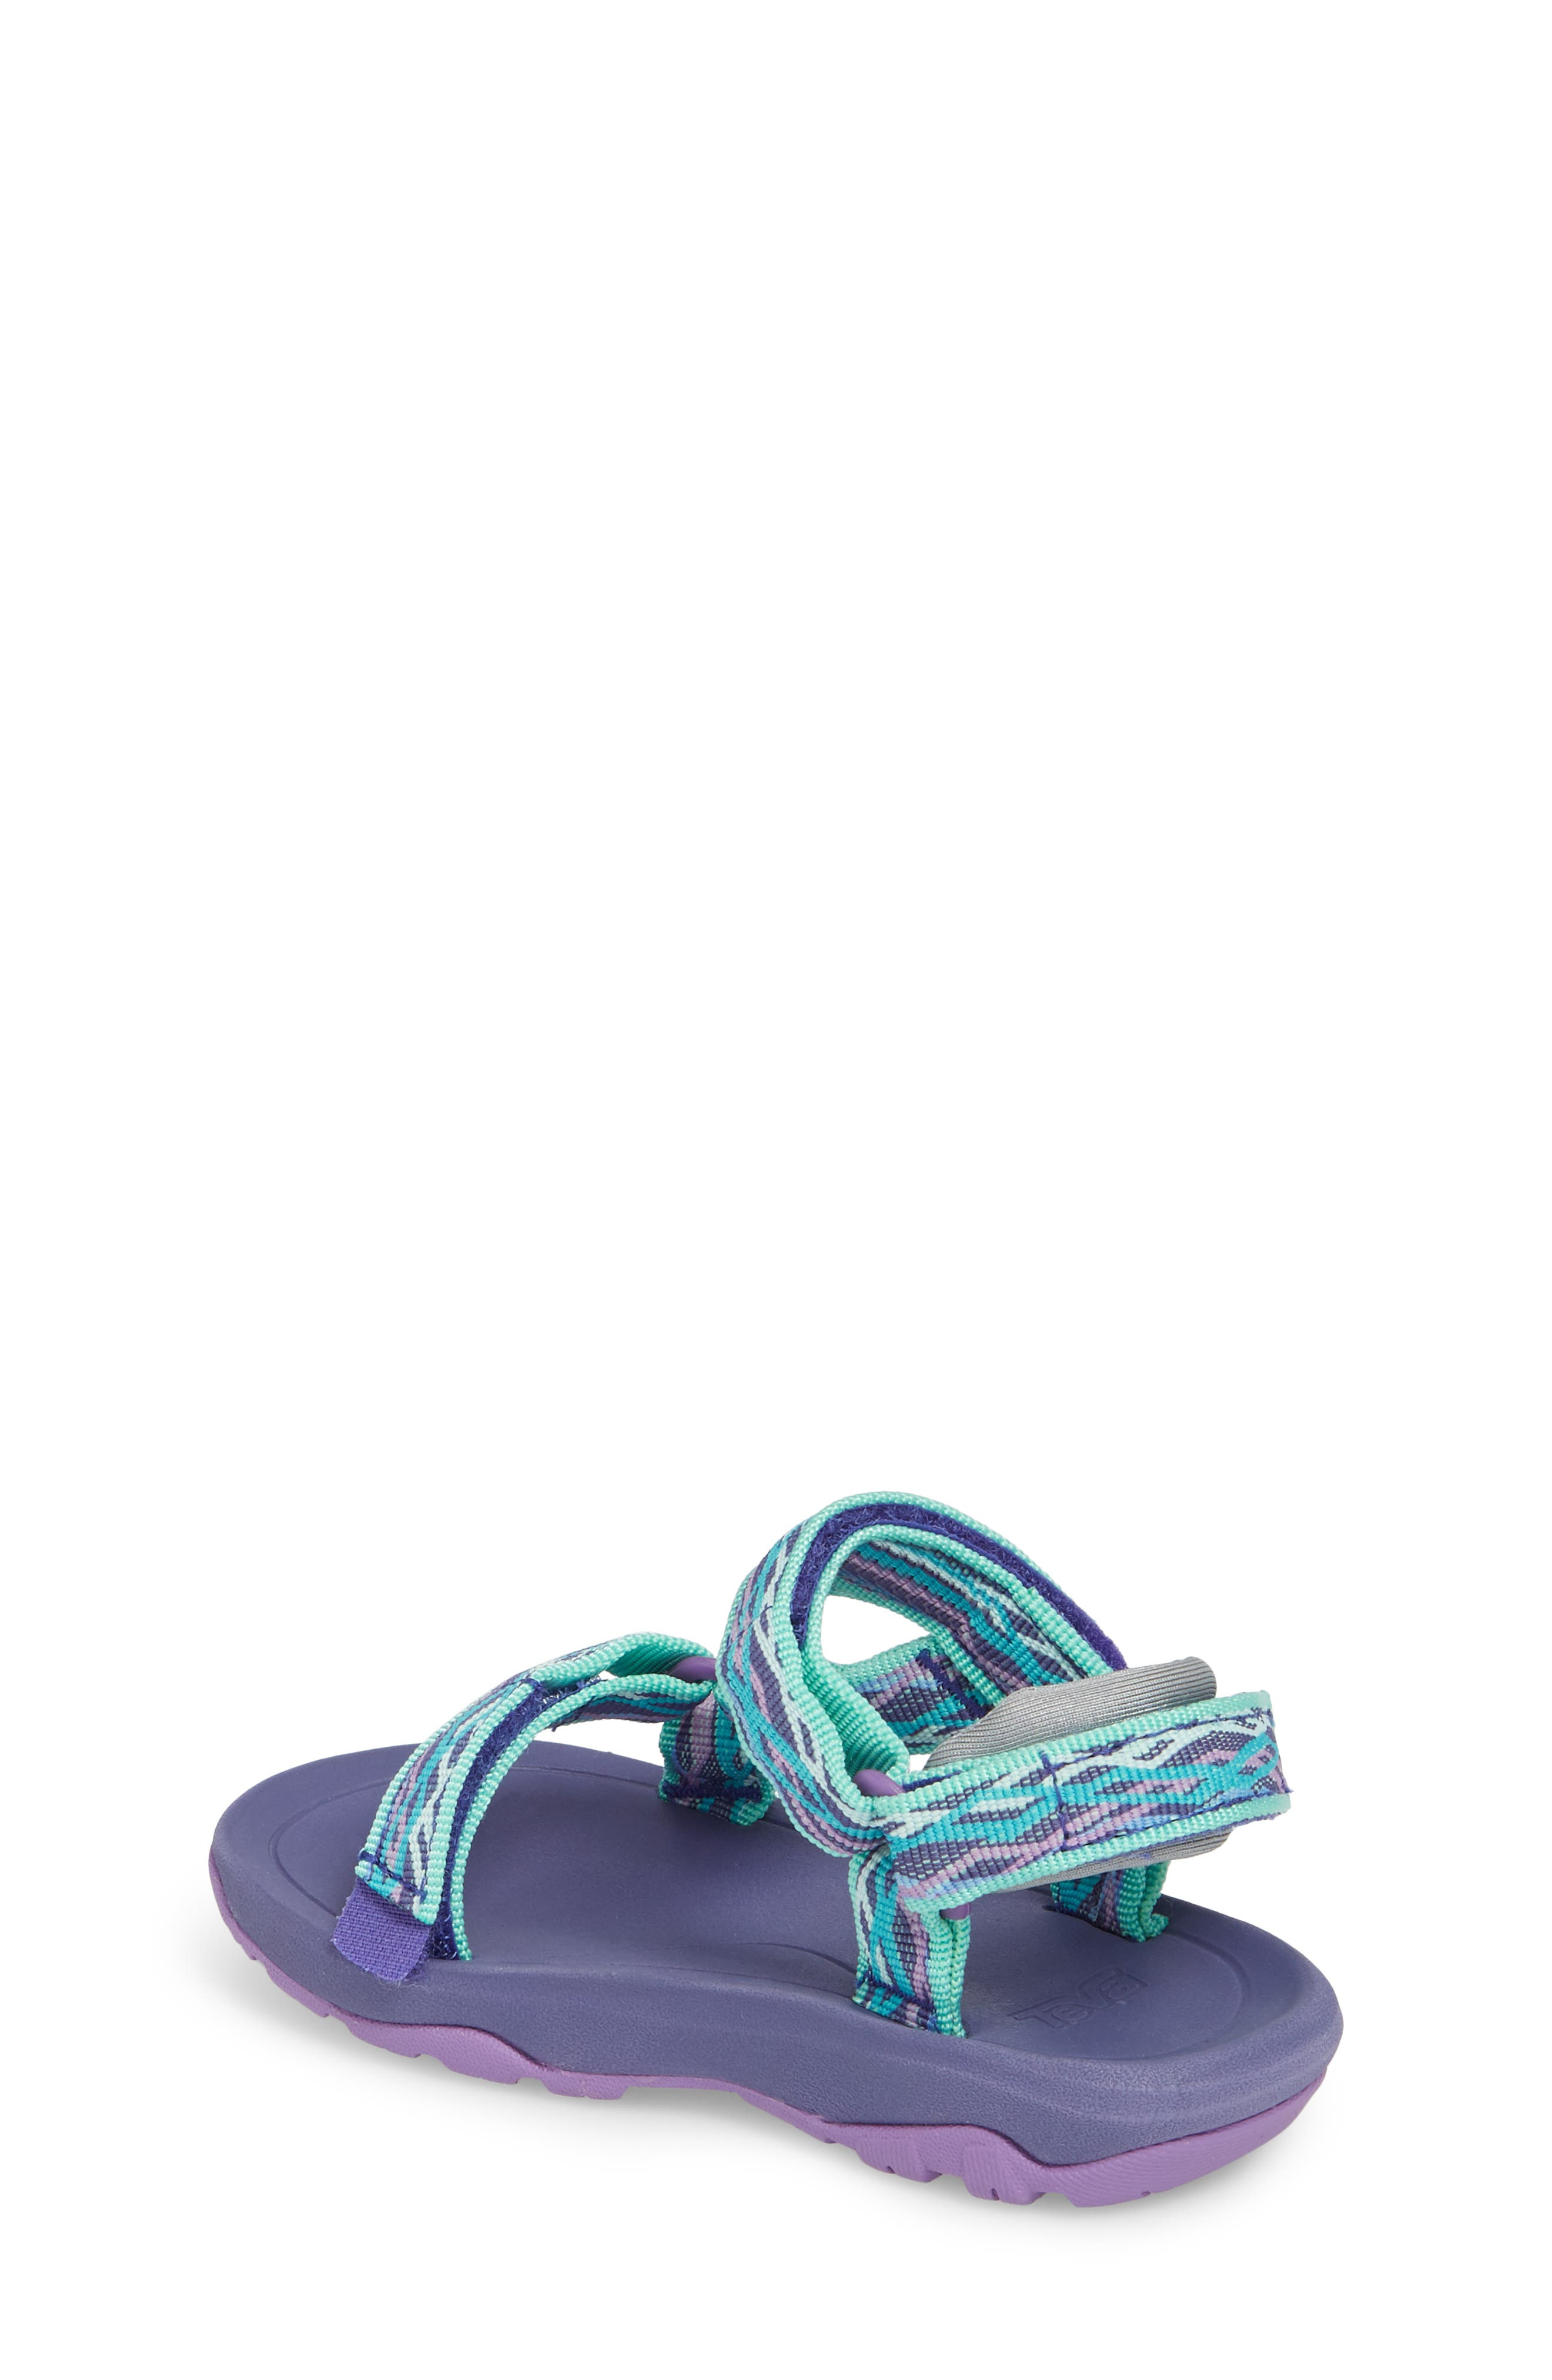 Hurricane XLT 2 Sandal,                             Alternate thumbnail 2, color,                             Delmar Sea Glass / Purple